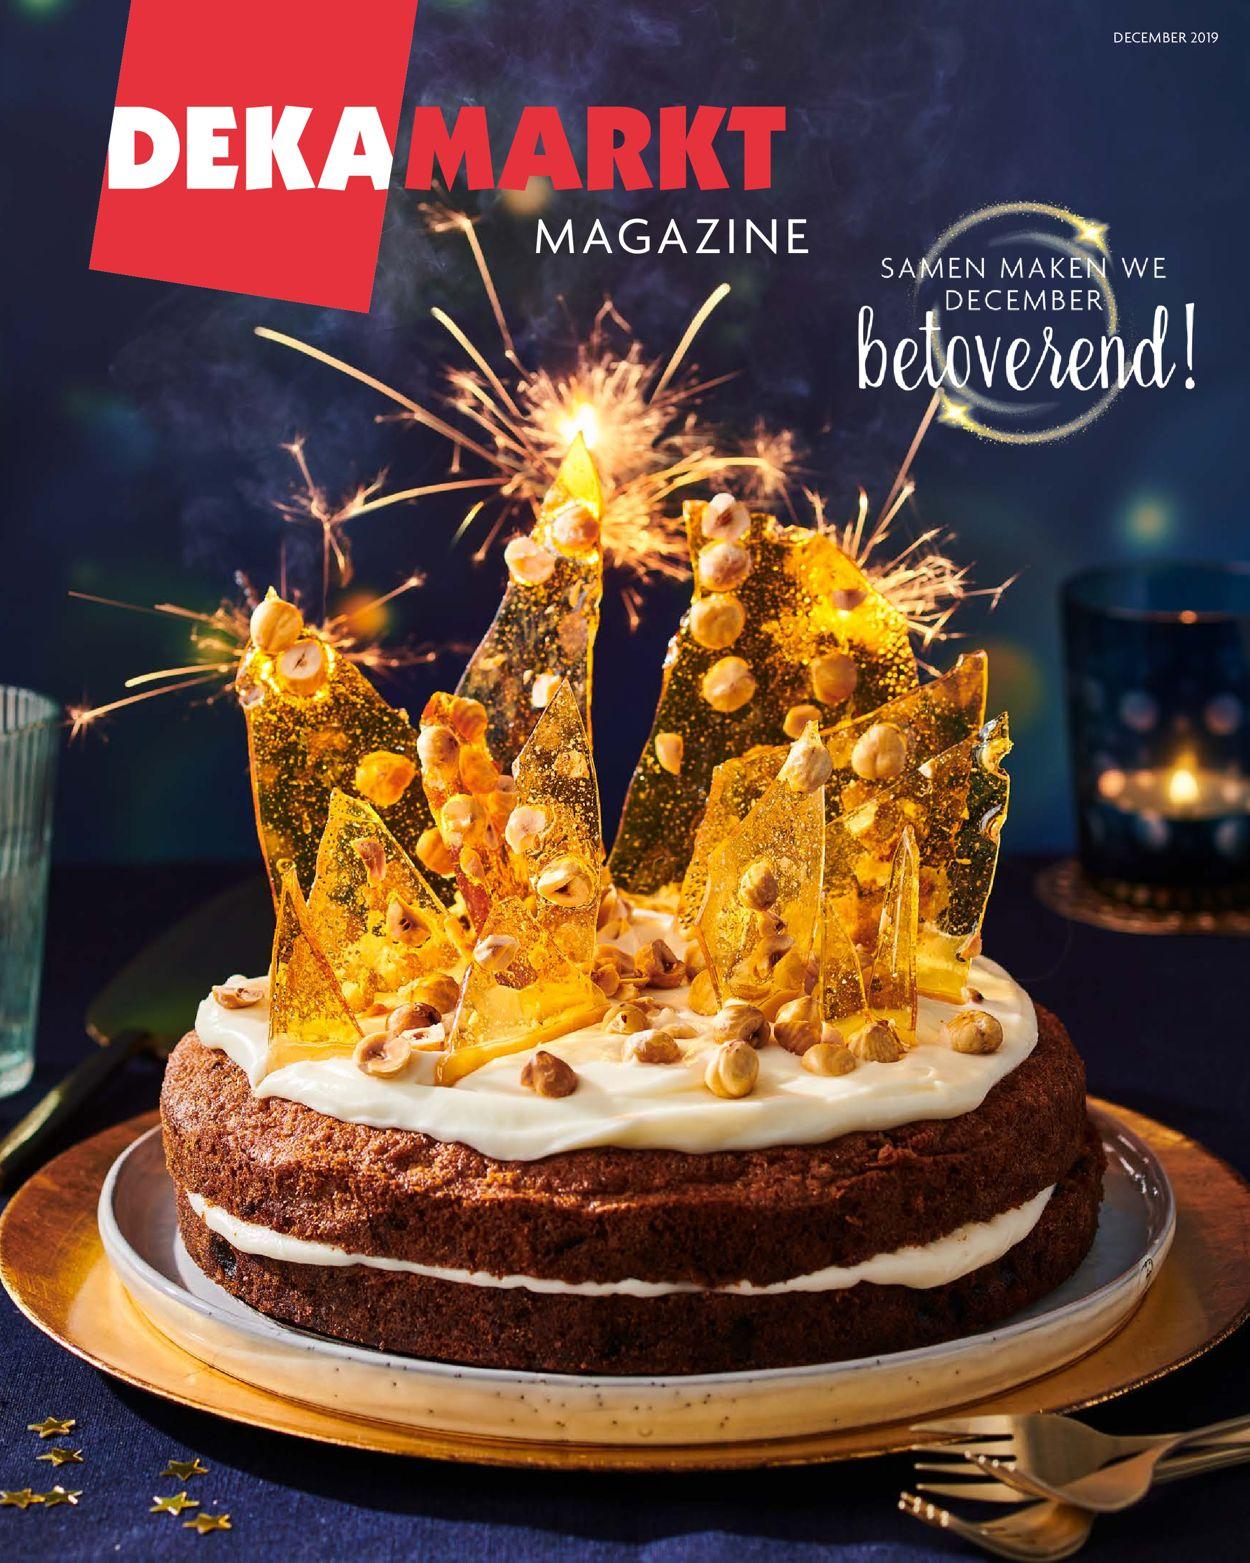 Dekamarkt kerstaanbieding 2019 Folder - 01.12-31.12.2019